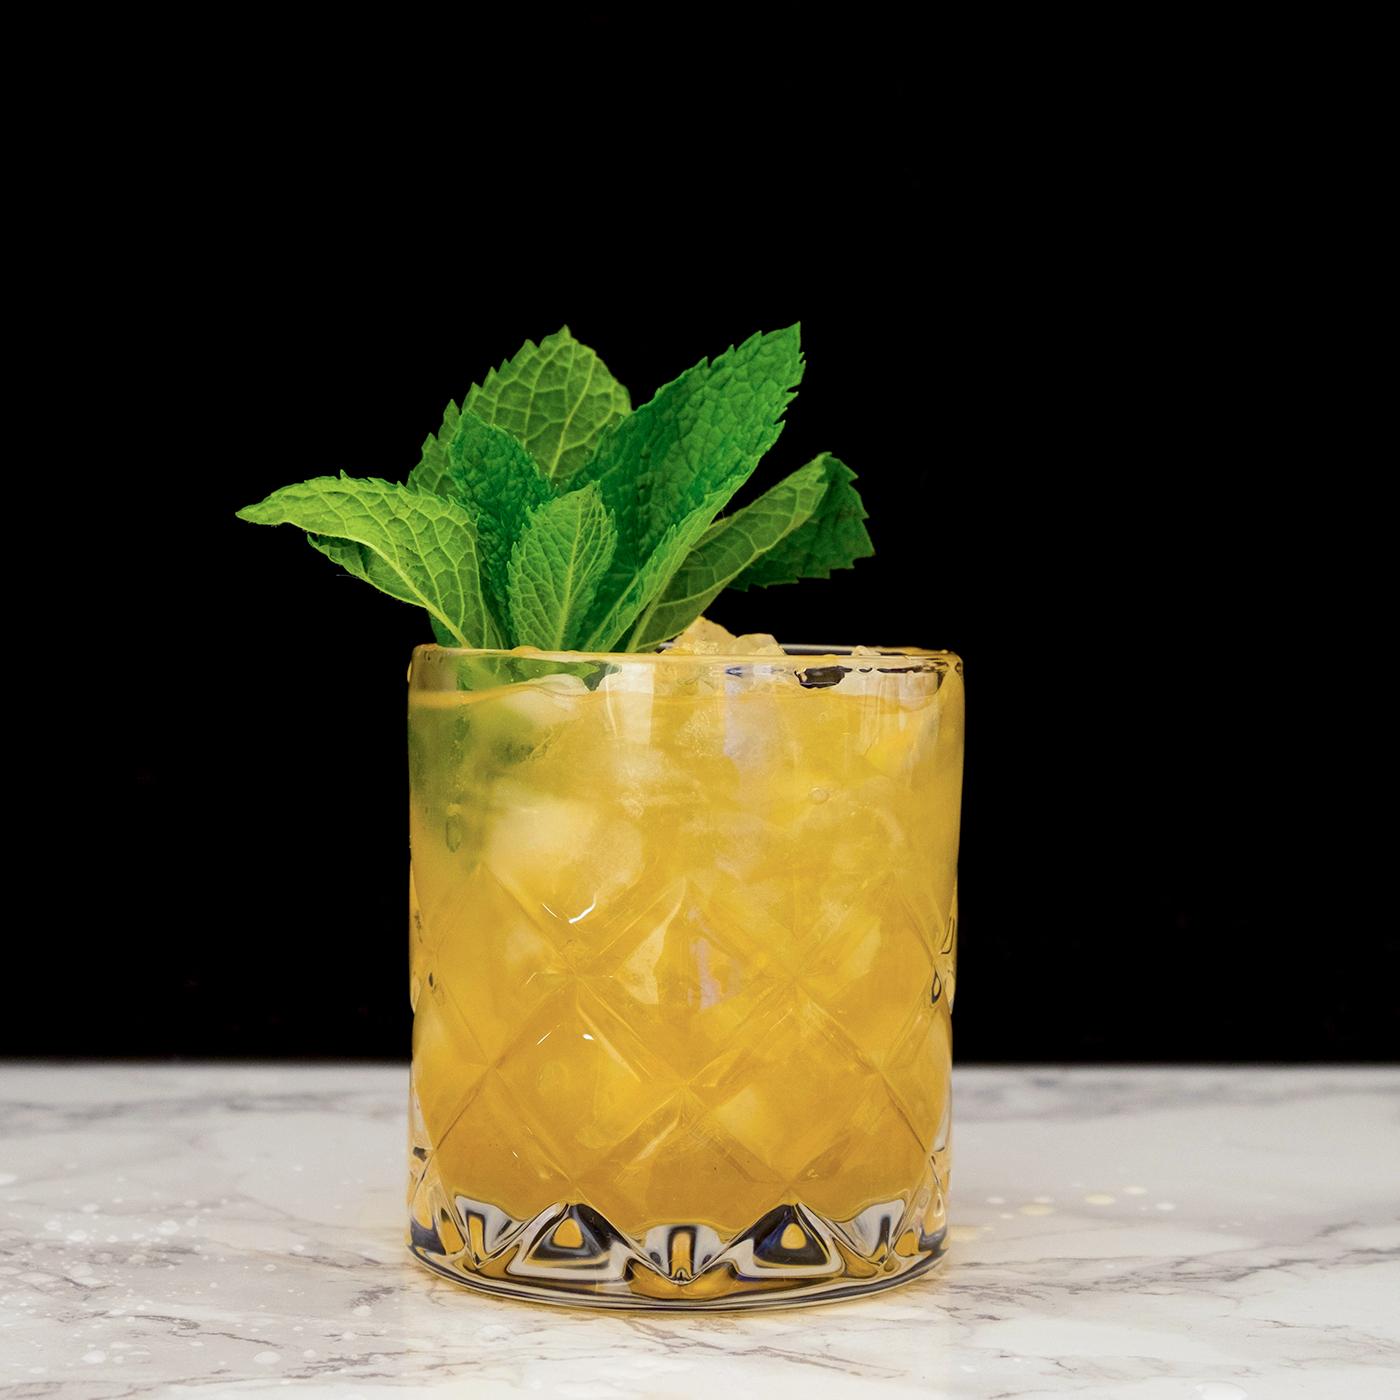 MAI TAI - Jamaican rum, lime juice, orange curacao, almond syrup